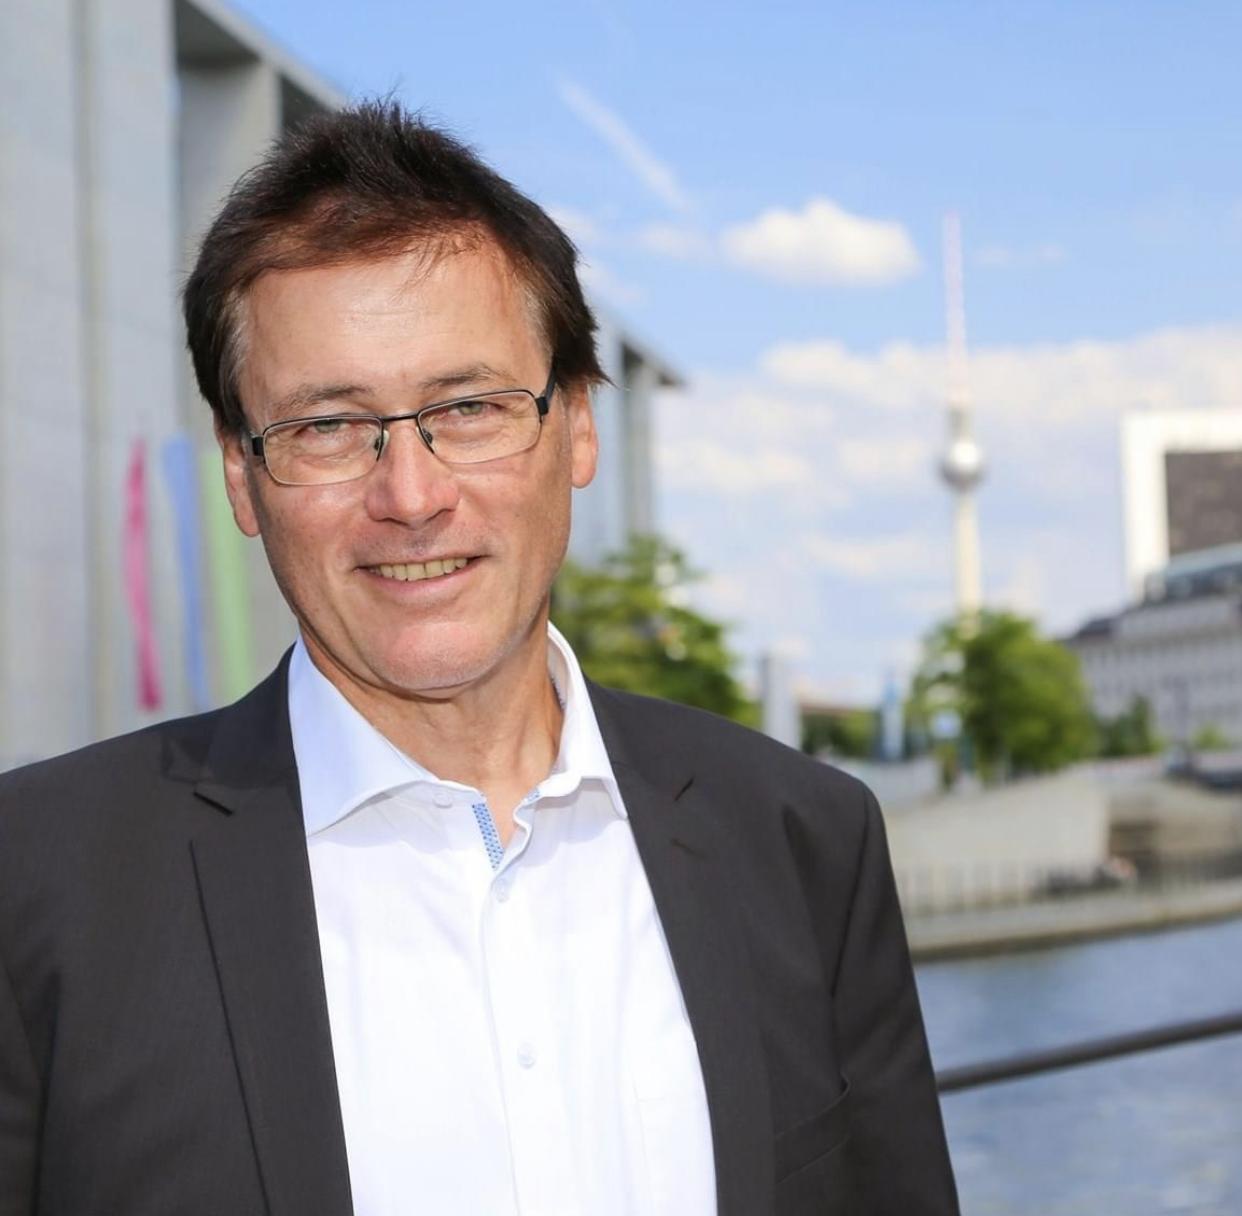 Gerald Ullrich, stv. Landesvorsitzender FDP TH